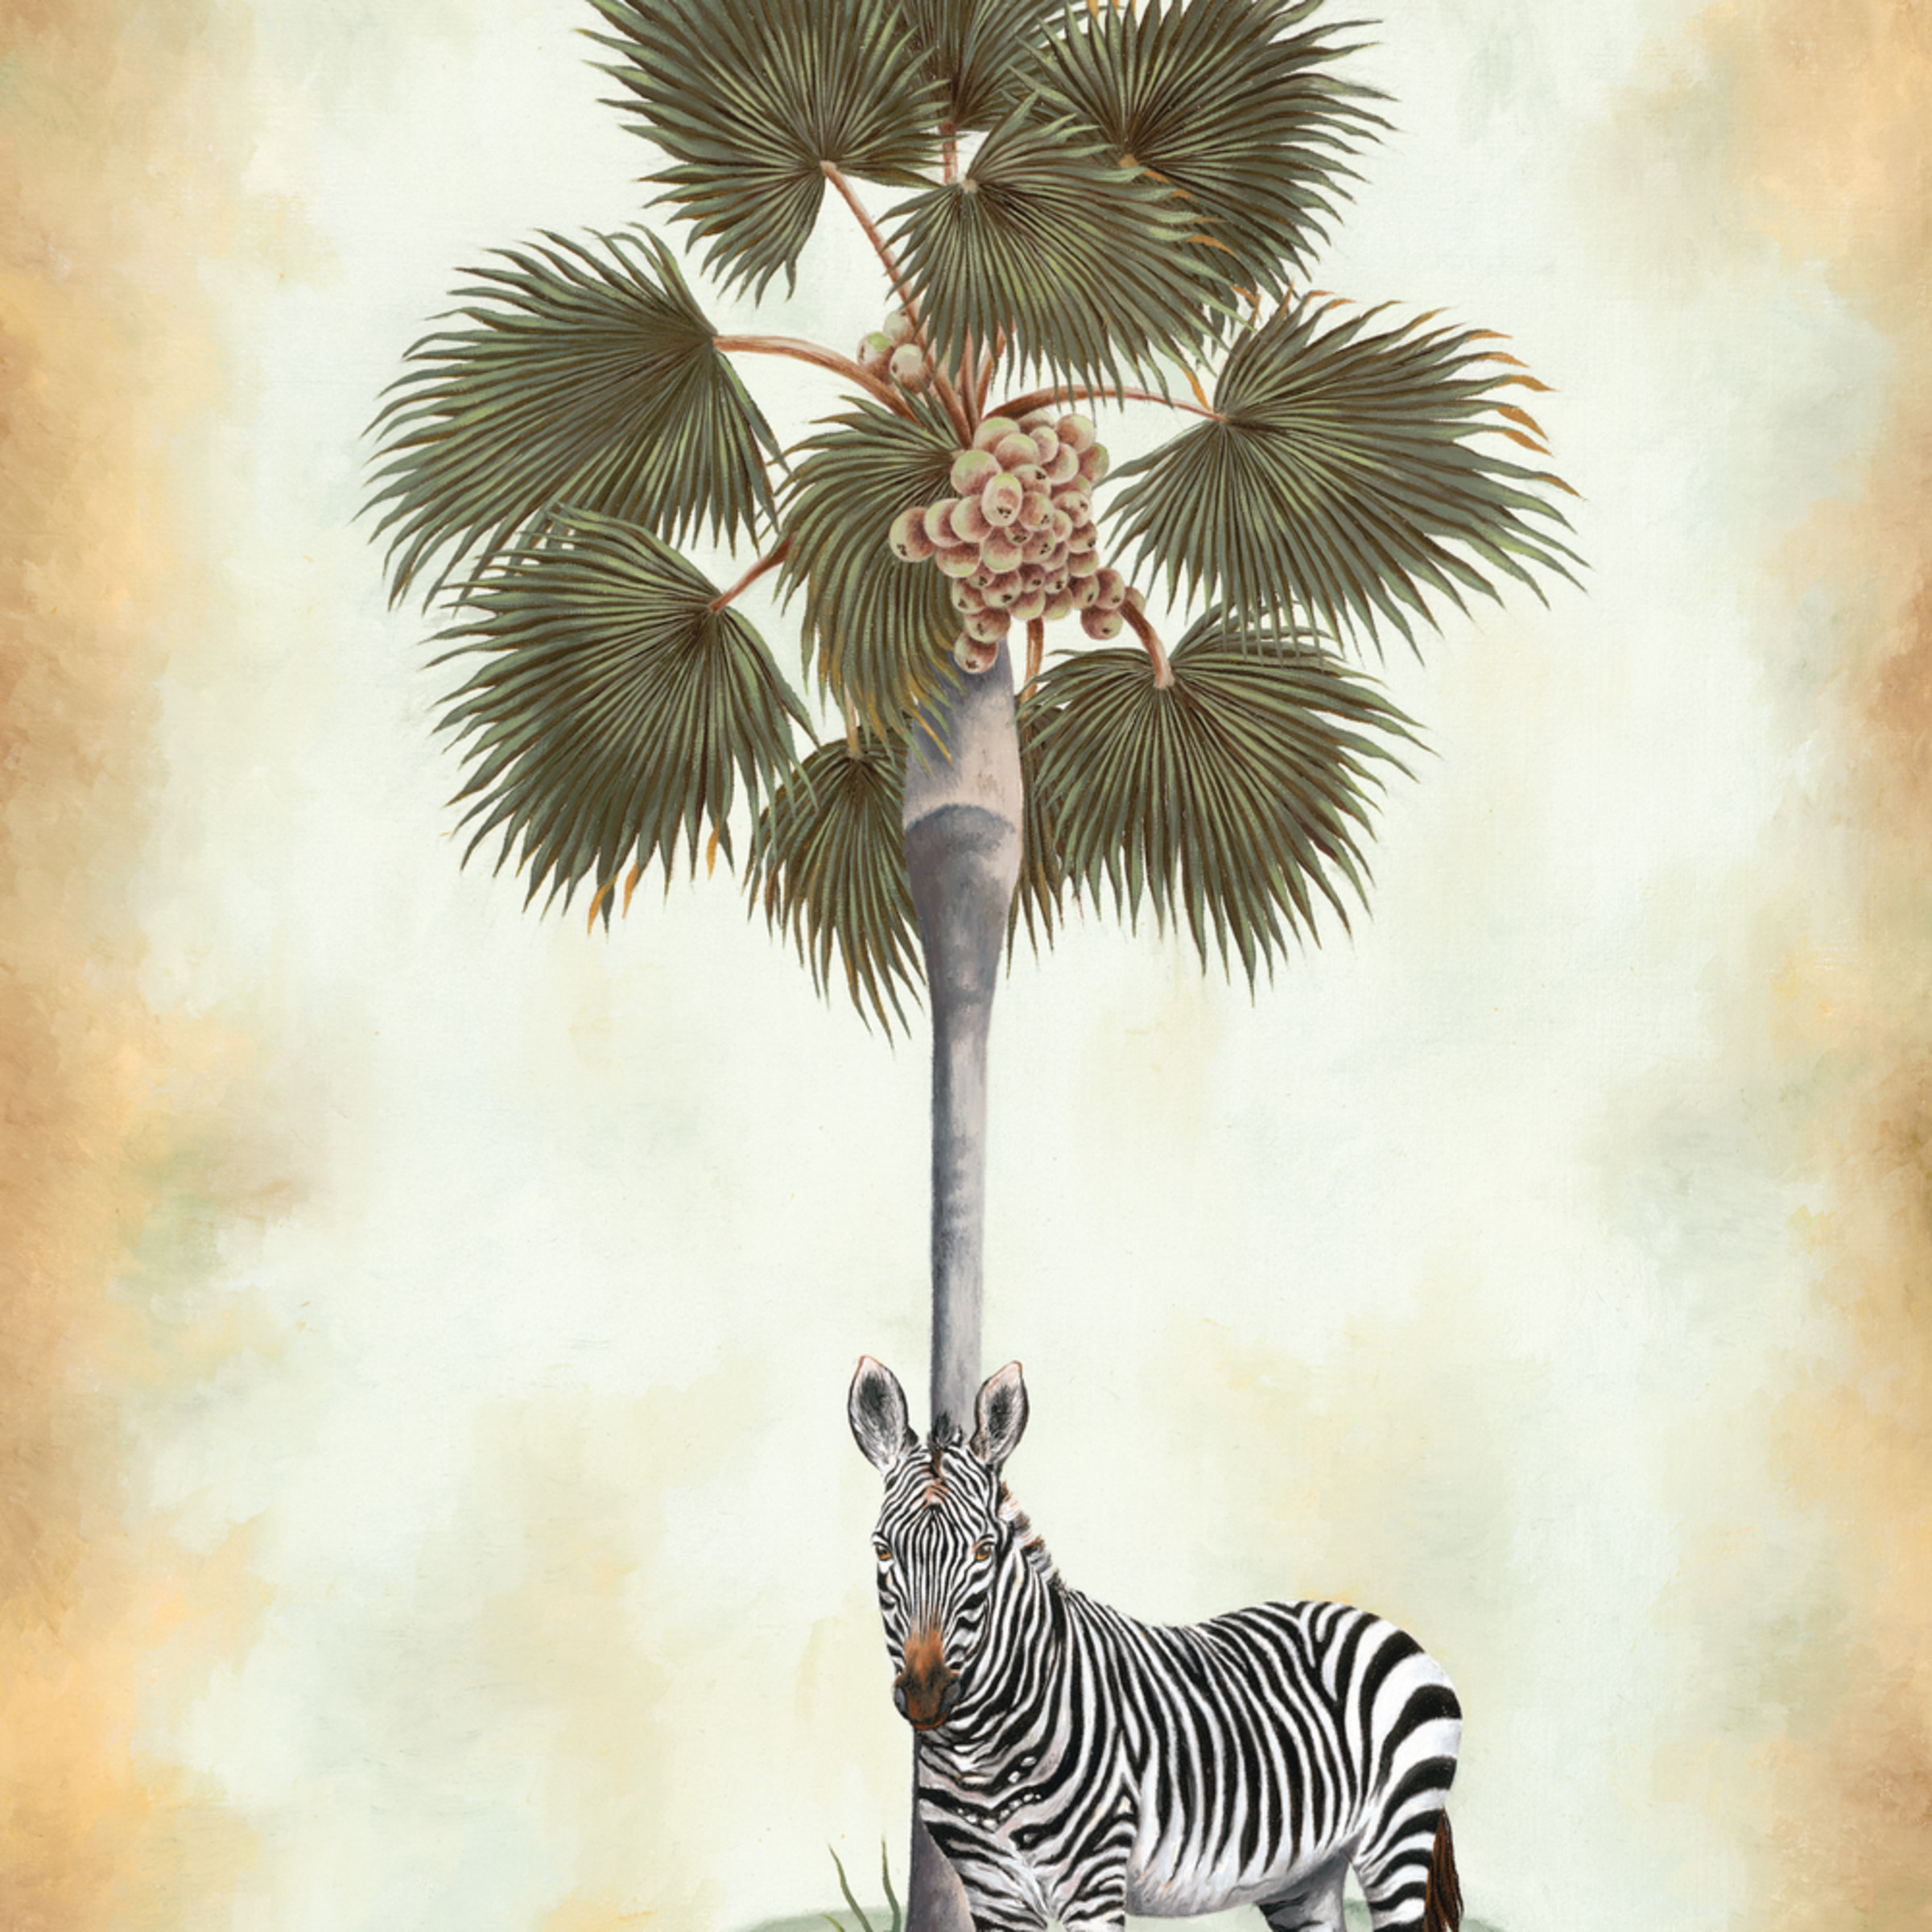 Zebra palm.rgbforasfprint mbqopu